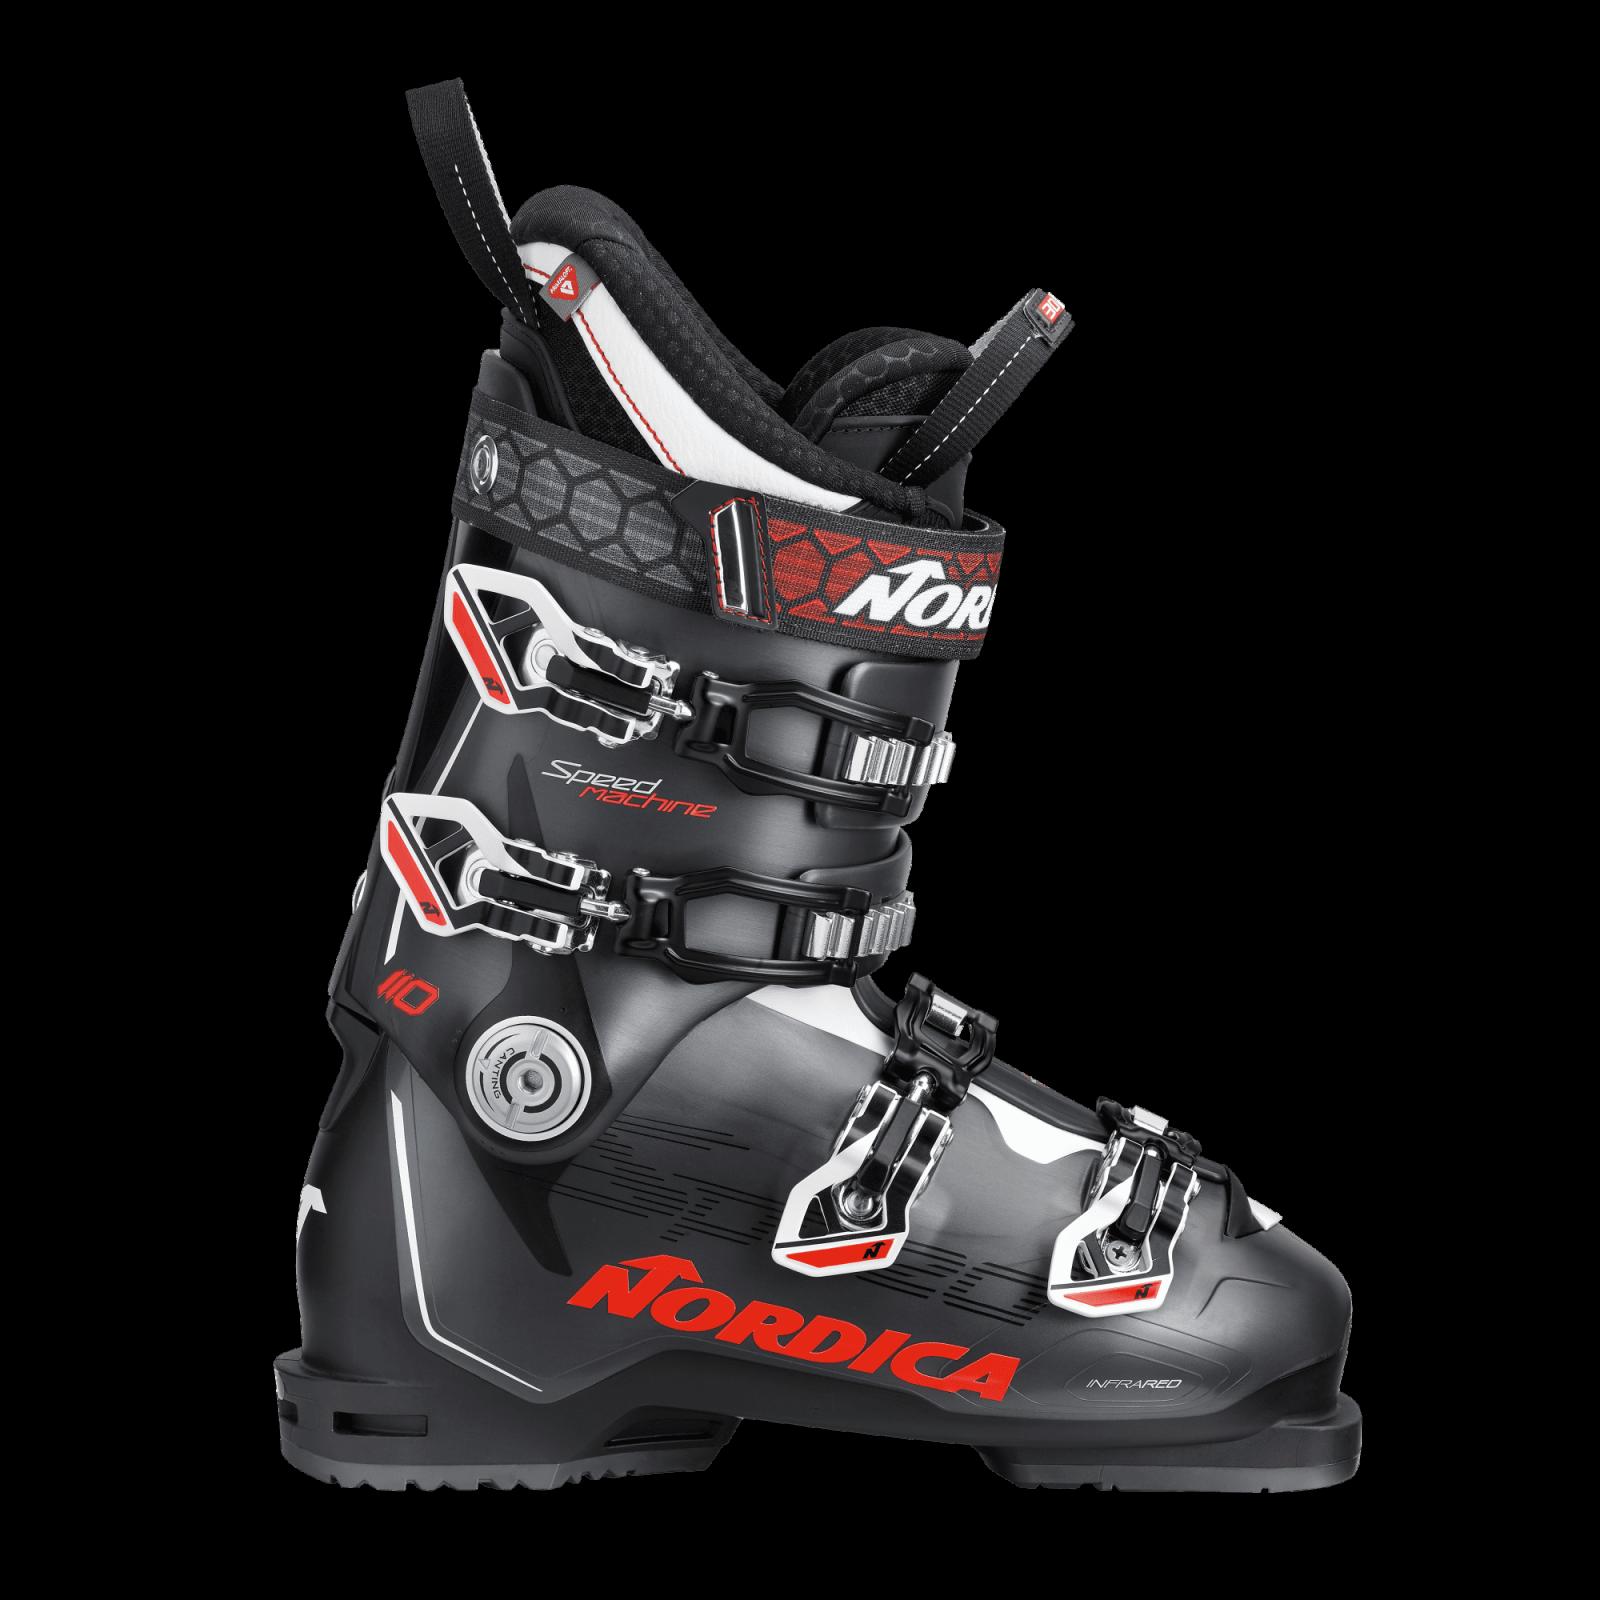 Nordica Speedmachine 110 Ski Boots 2019